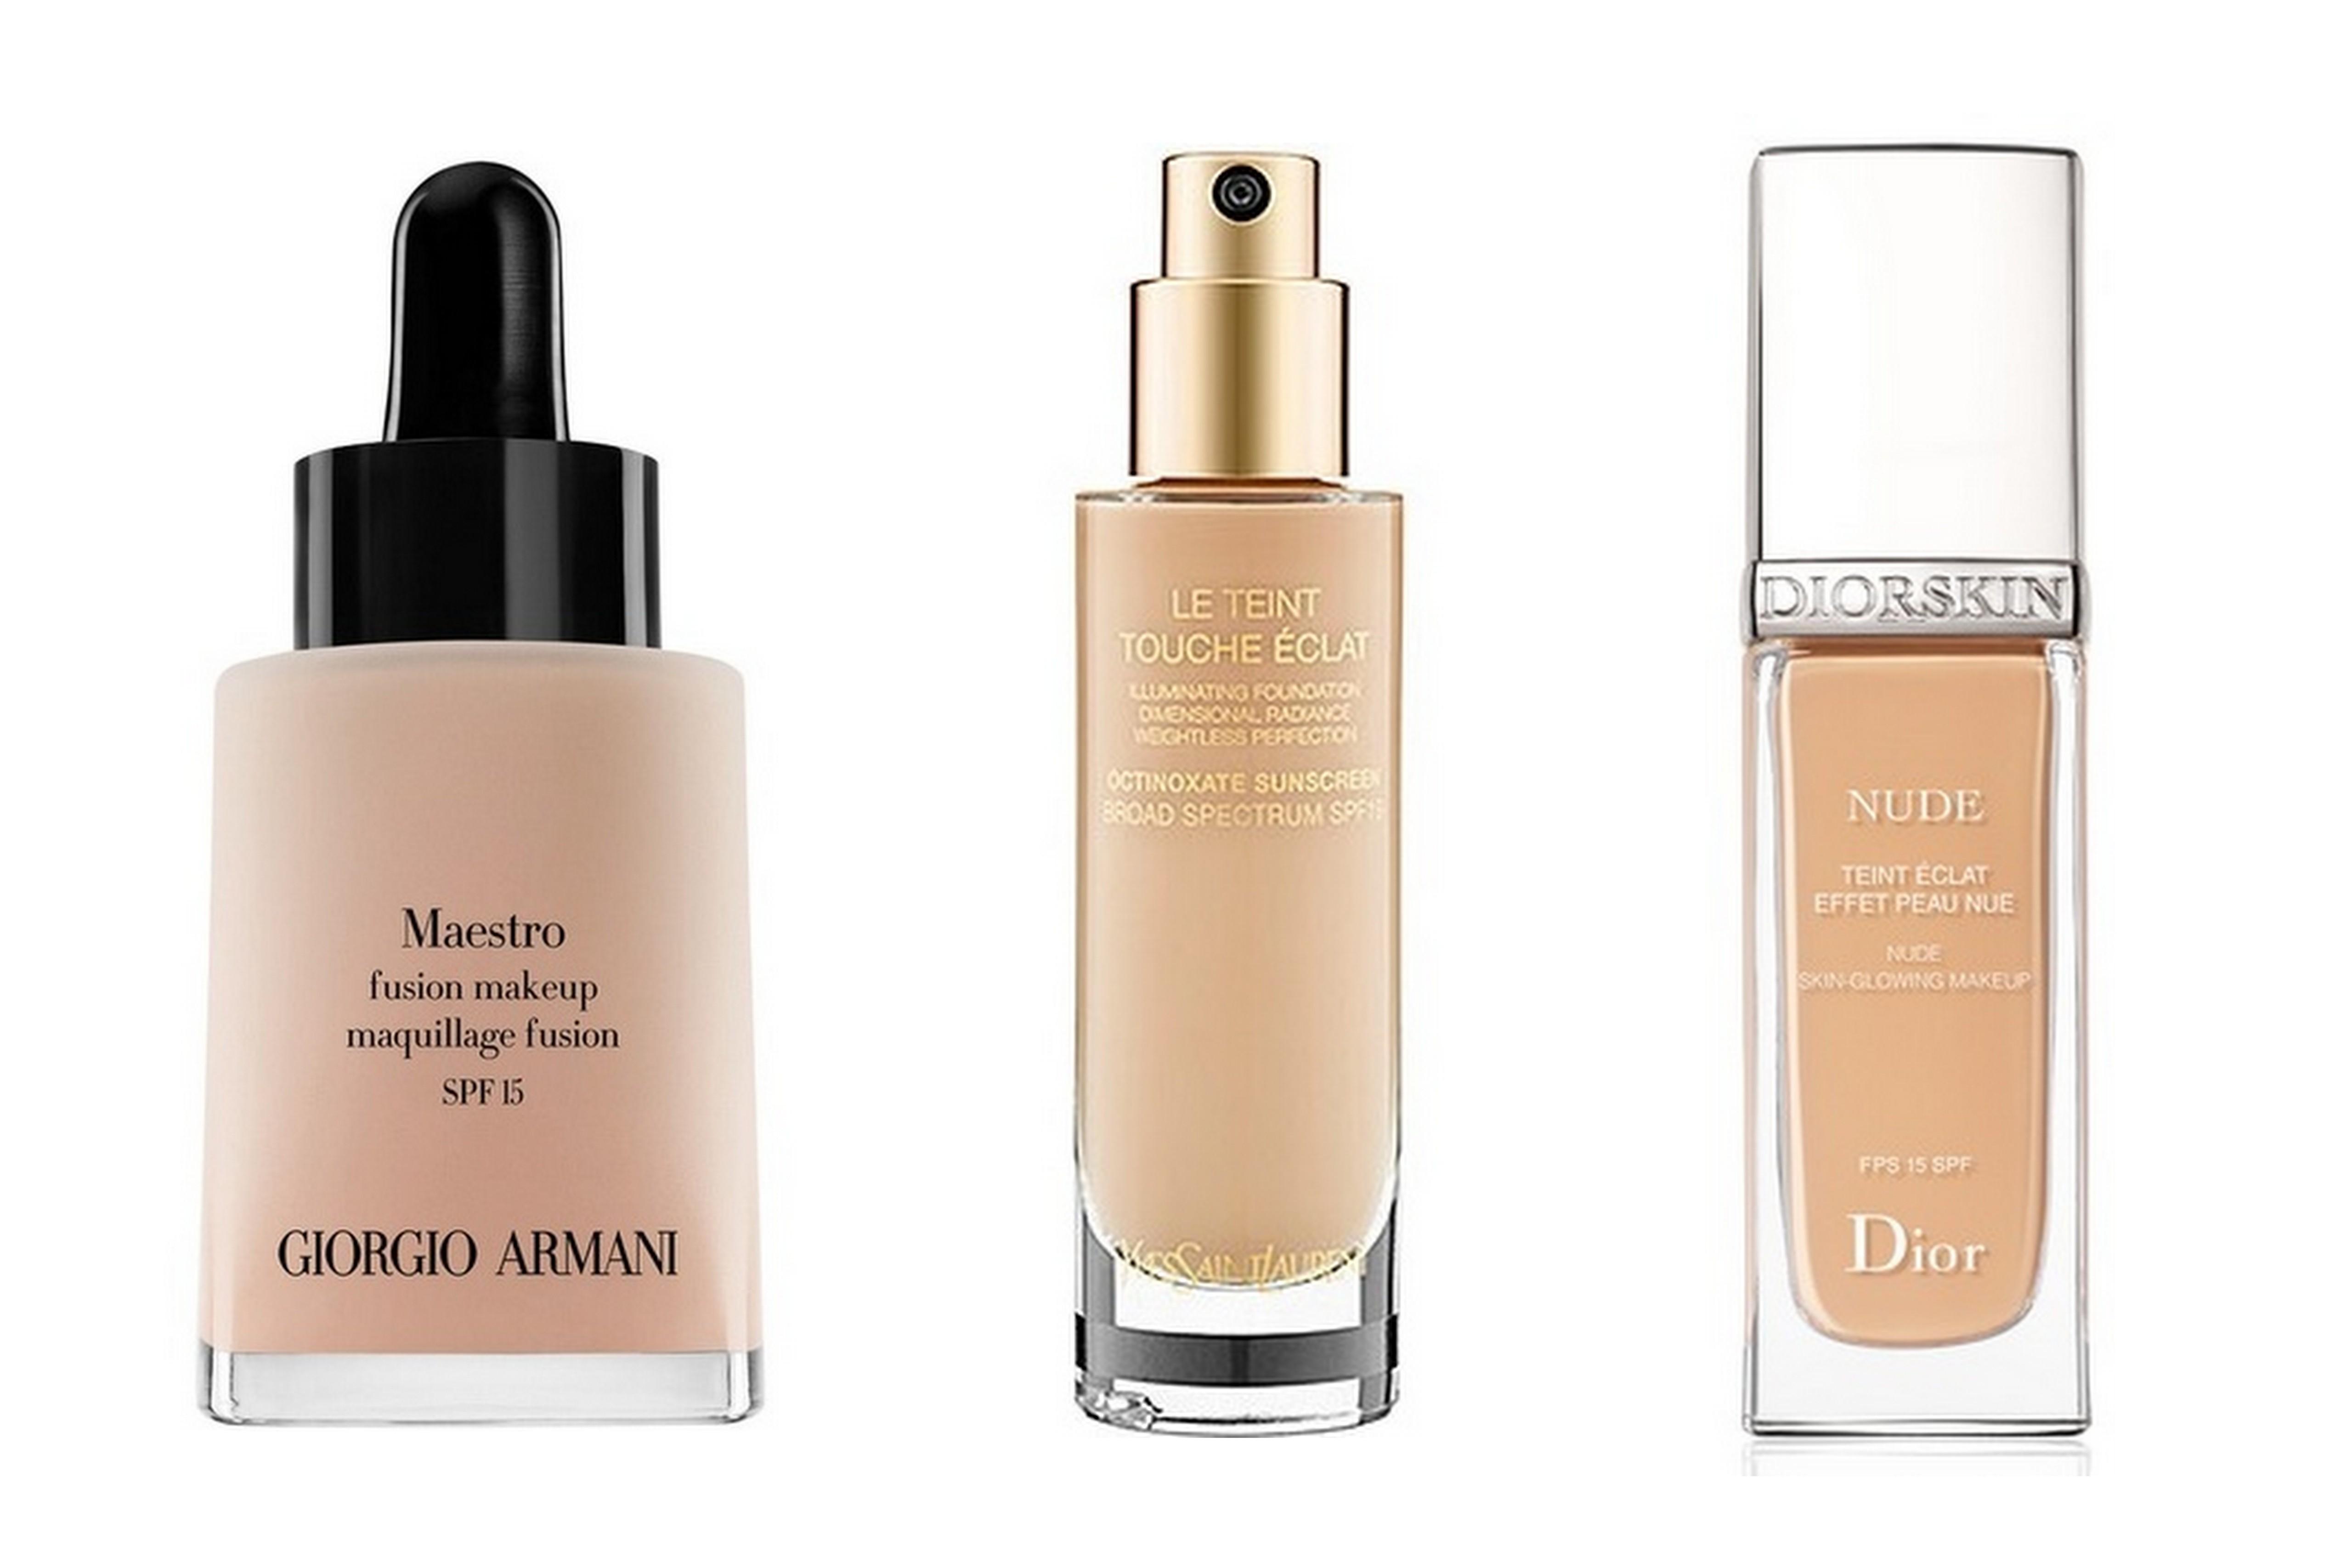 Fall 2012 foundations - Giorgio Armani Maestro Fusion Makeup, YSL Le Teint Touche Eclat, Dior Diorskin Nude Fluid Foundation